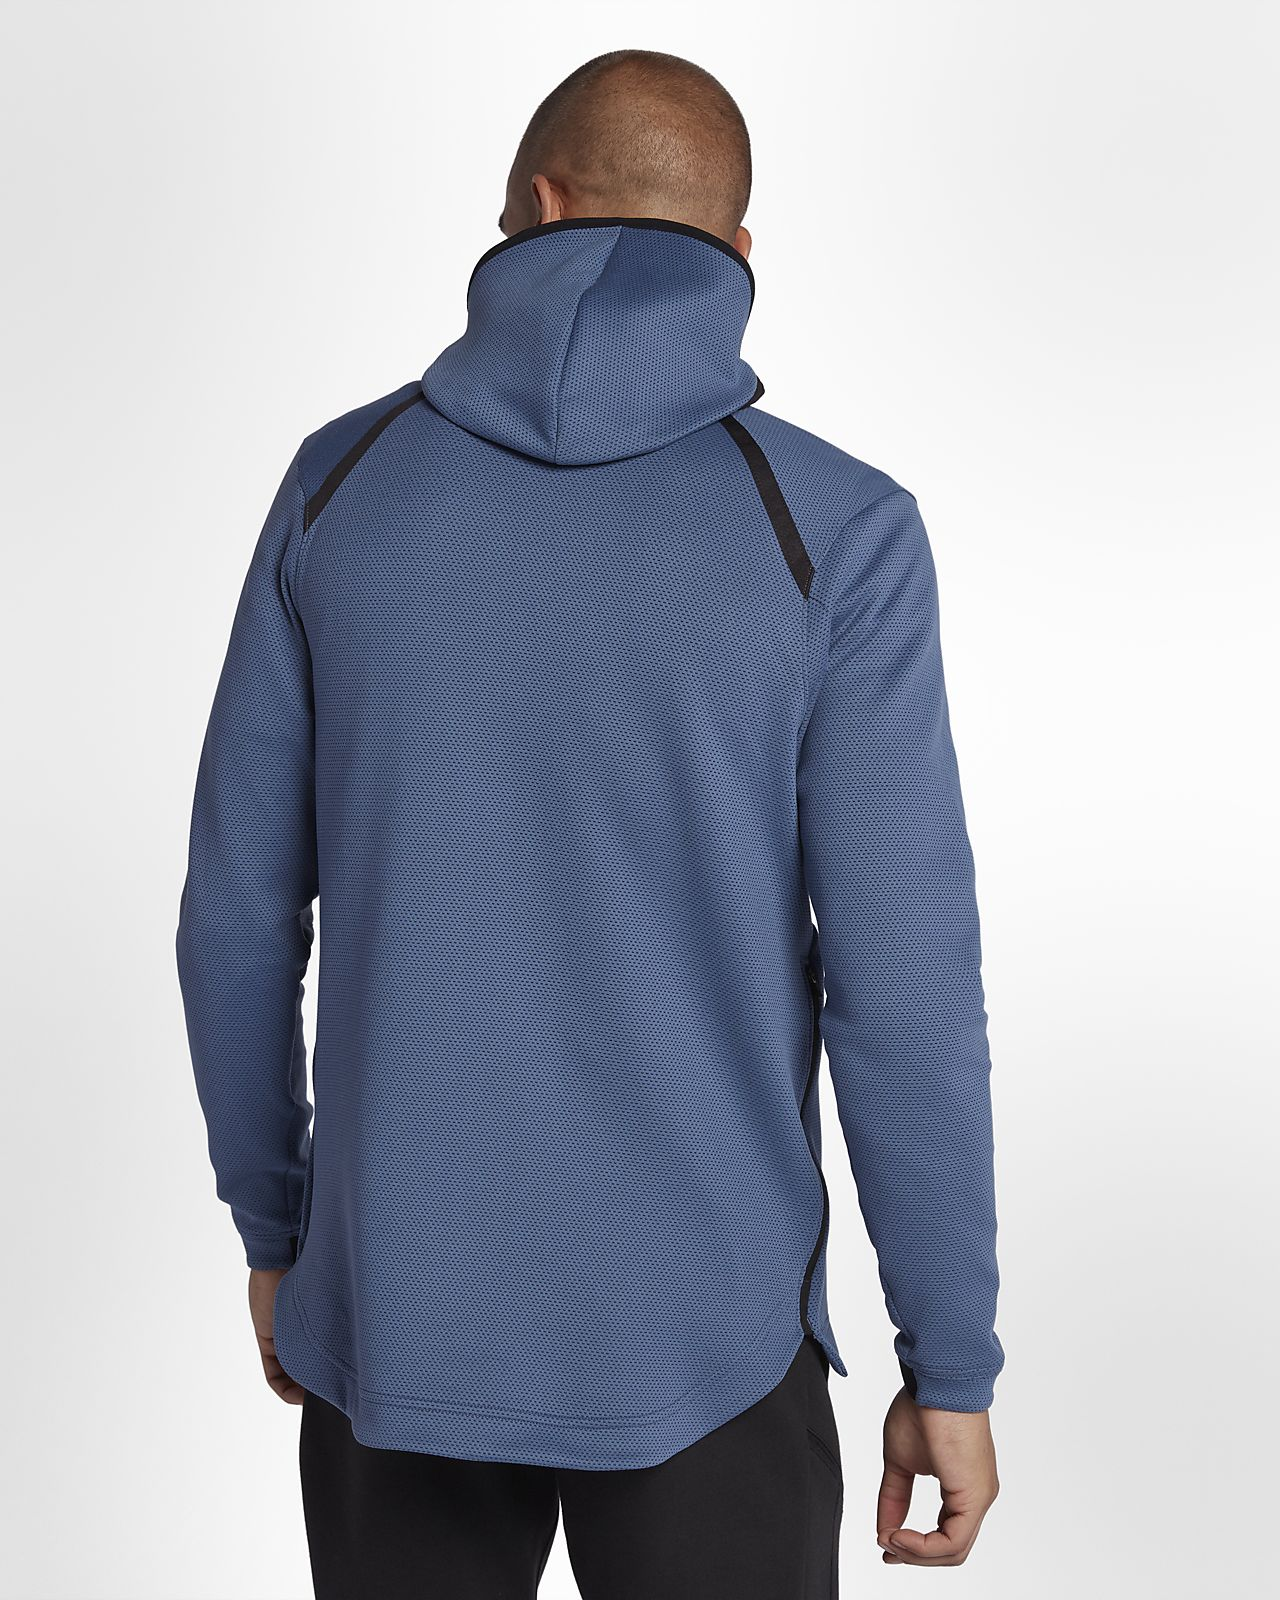 ... Nike Therma Flex Showtime Men's Basketball Full-Zip Hoodie